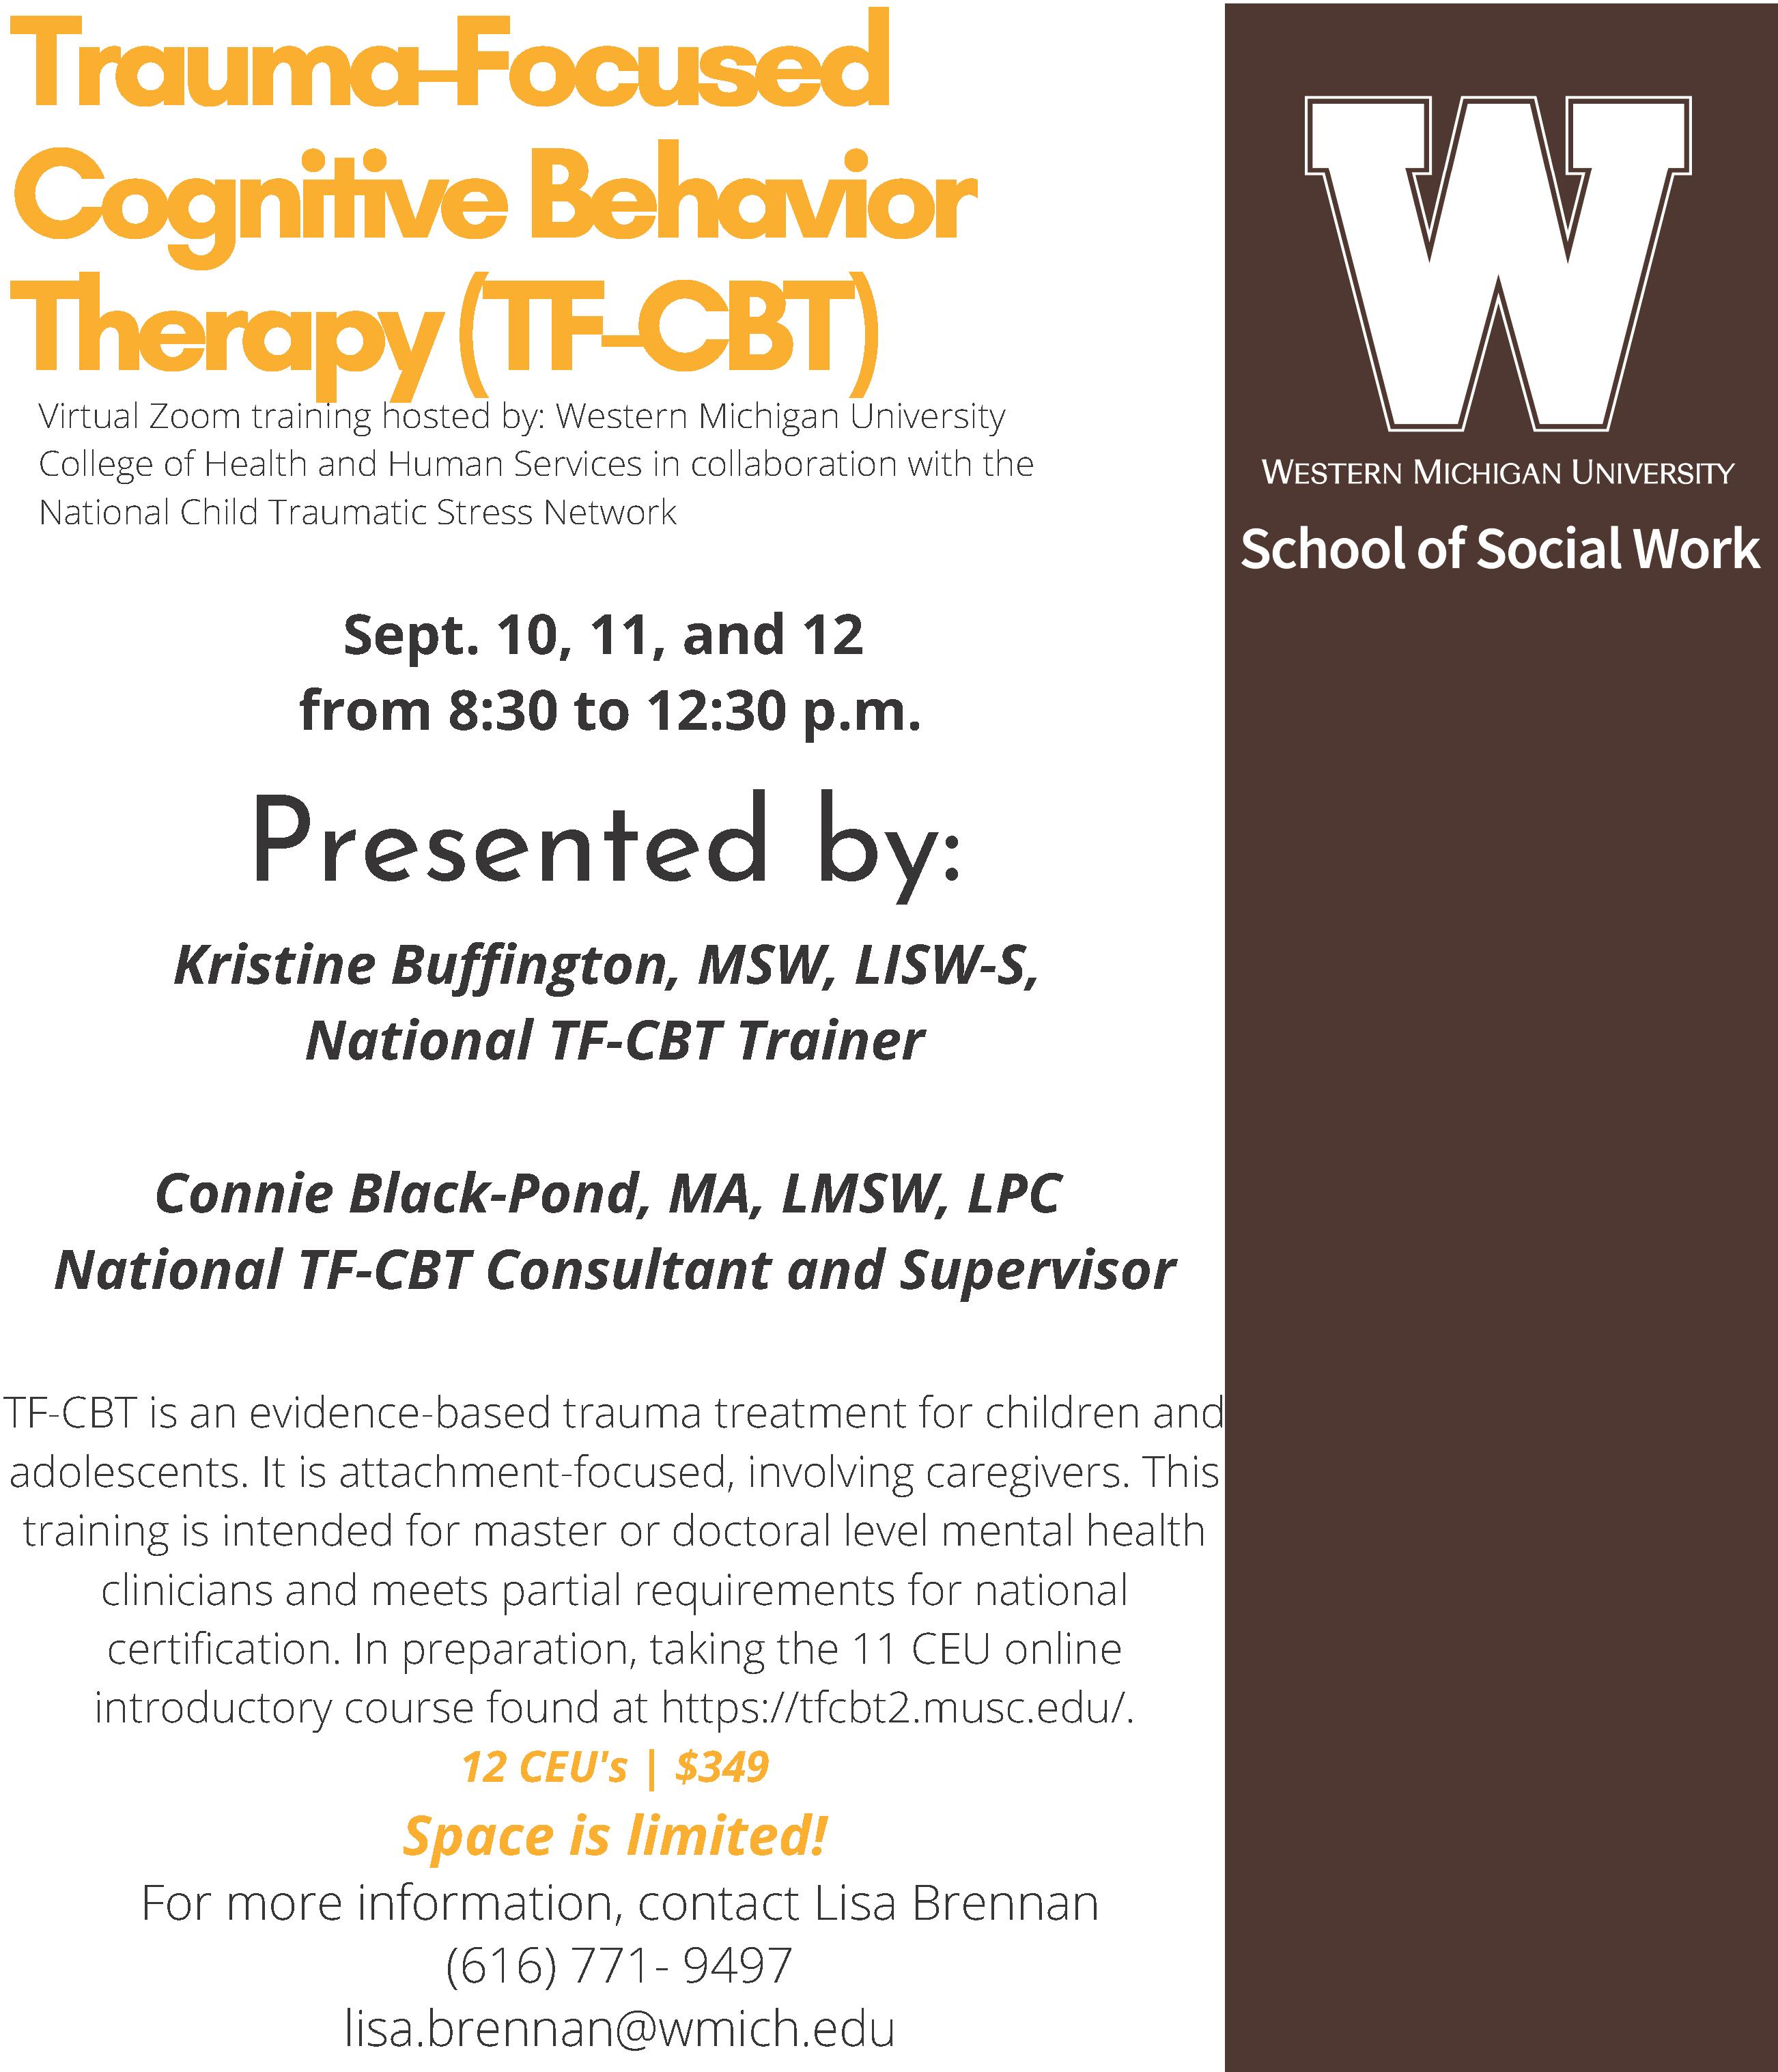 cbt trauma tf focused cognitive therapy edu tfcbt behavior continuing sw education